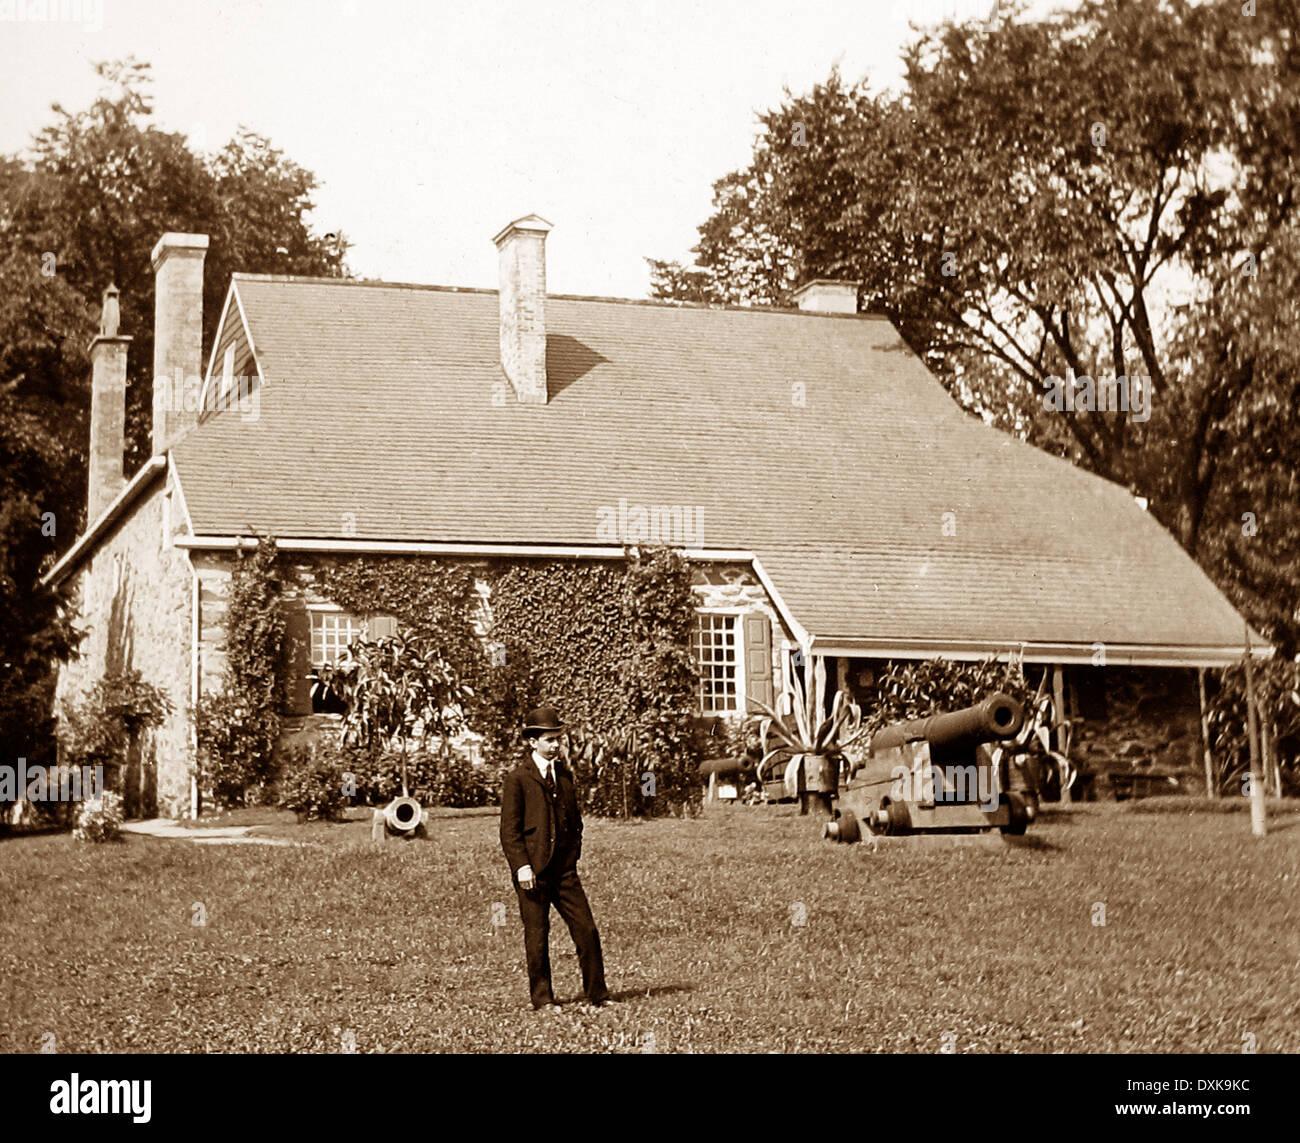 George Washington's HQ at Newburgh USA early 1900s - Stock Image